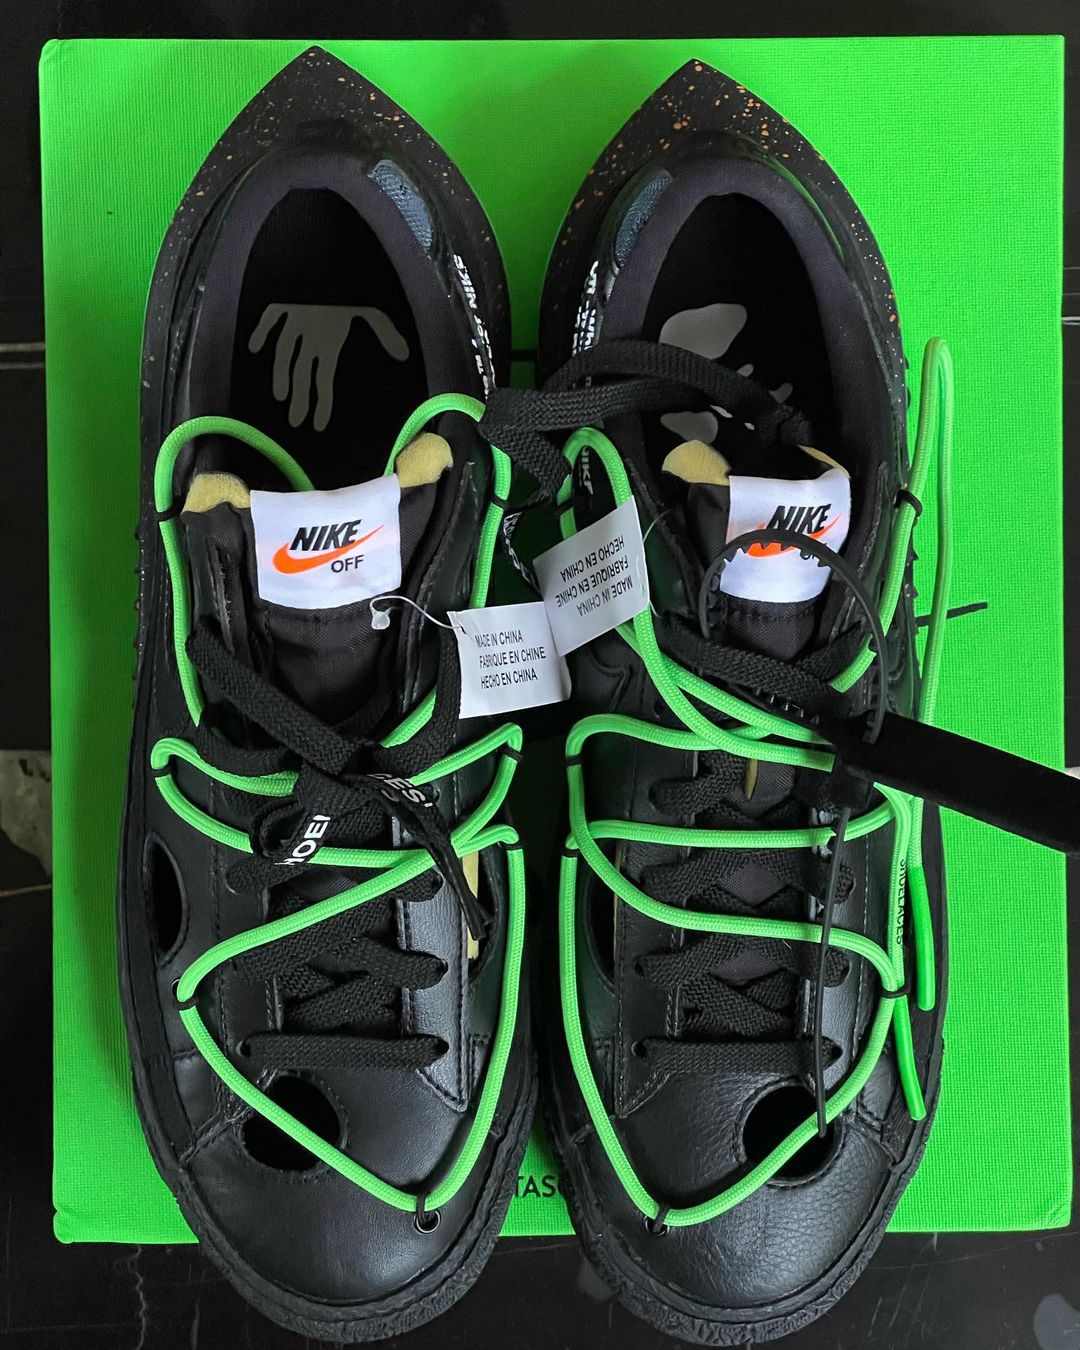 Off-White Nike Blazer Low Black Green Release Info